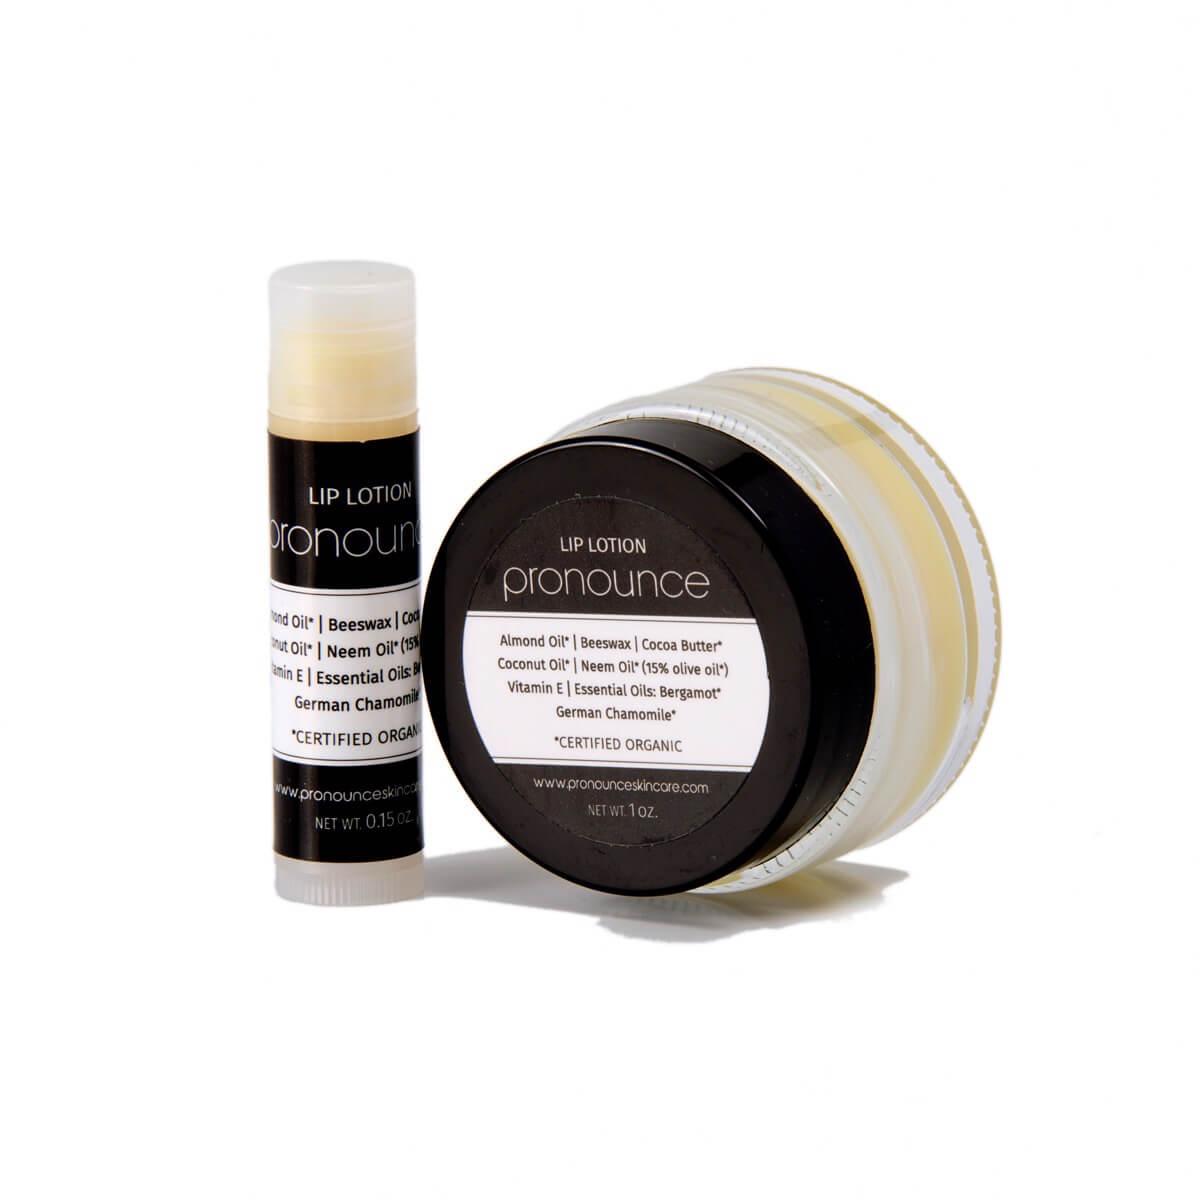 Lip Lotion (tube and jar) - Pronounce Skincare 1200 x 1200